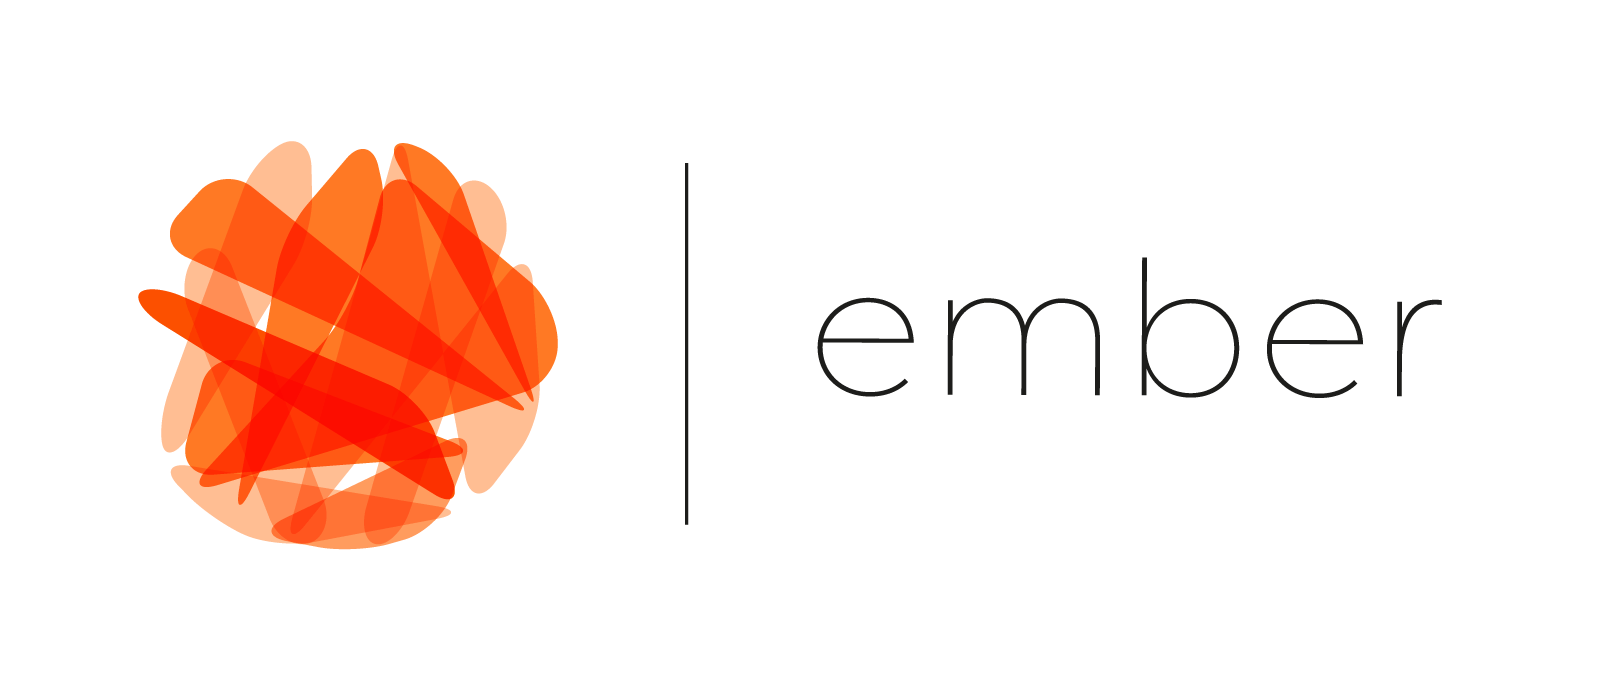 Introducing Ember